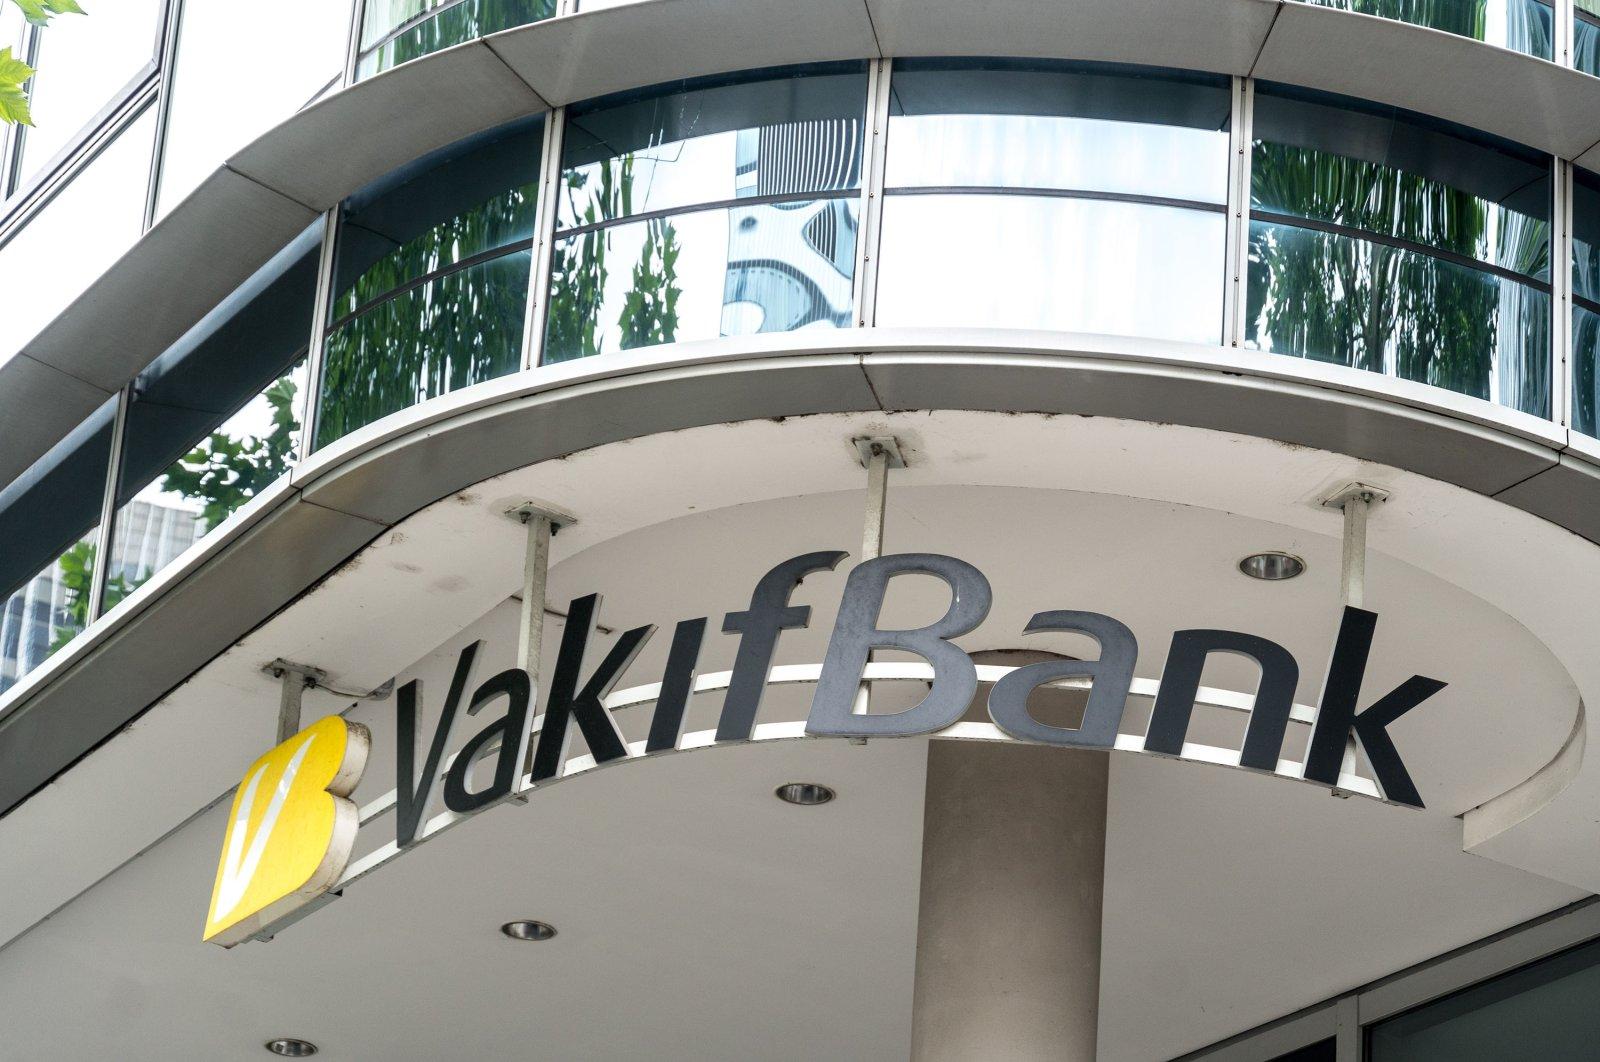 The logo of VakıfBank branch, the fifth largest bank in Turkey seen in Frankfurt am Main, Germany, June 28, 2020. (Shutterstock Photo)